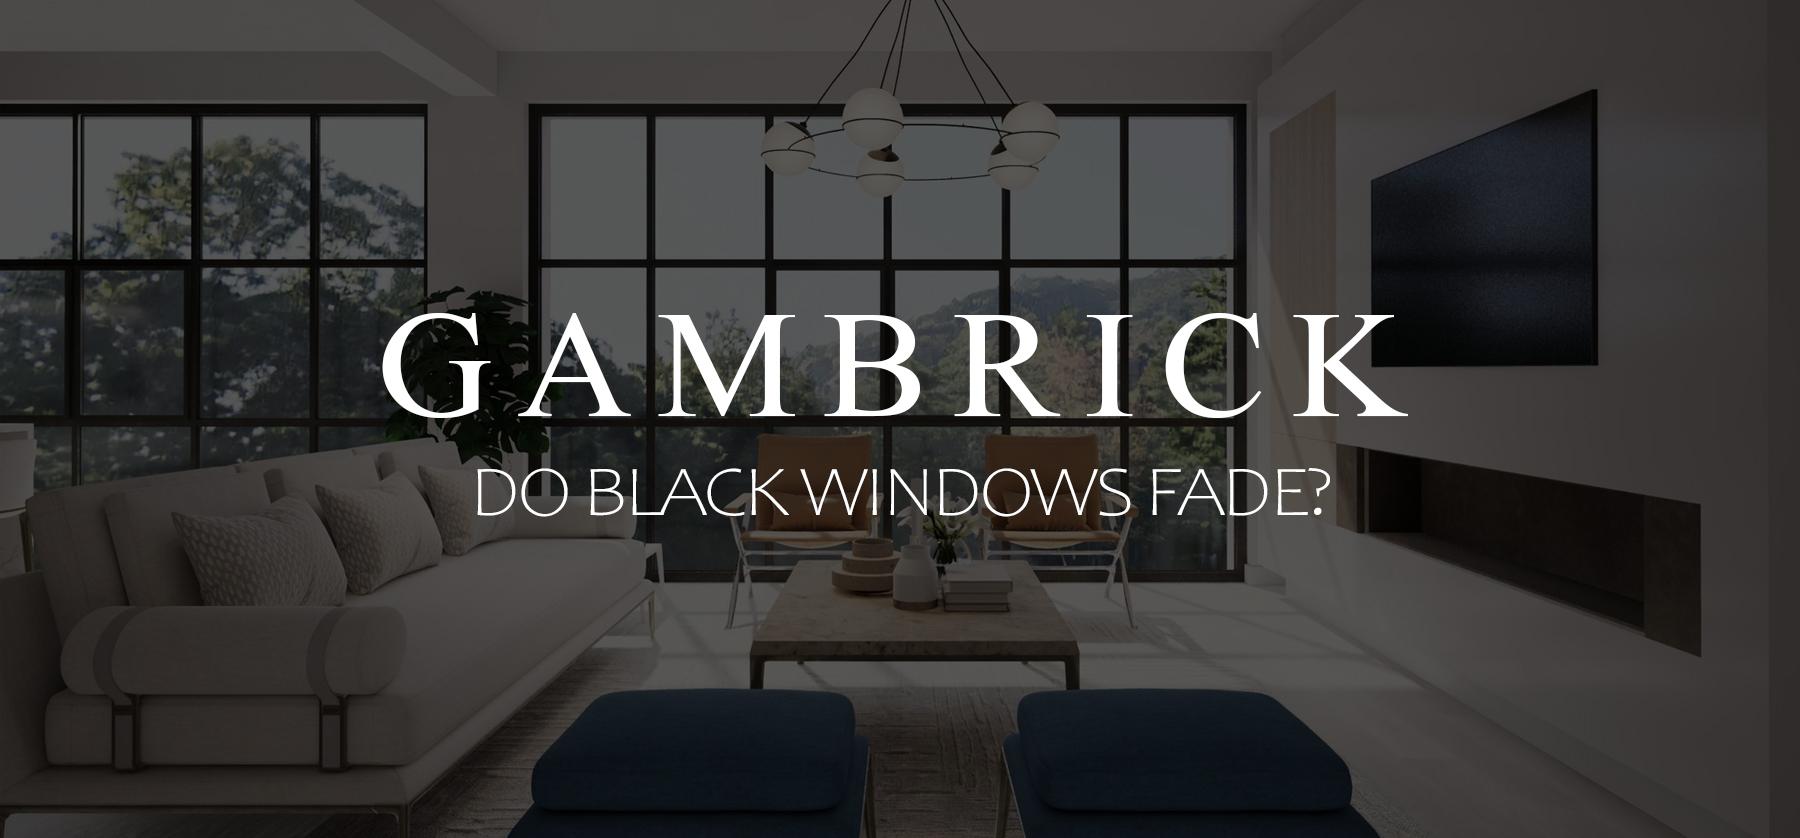 do black windows fade? banner pic